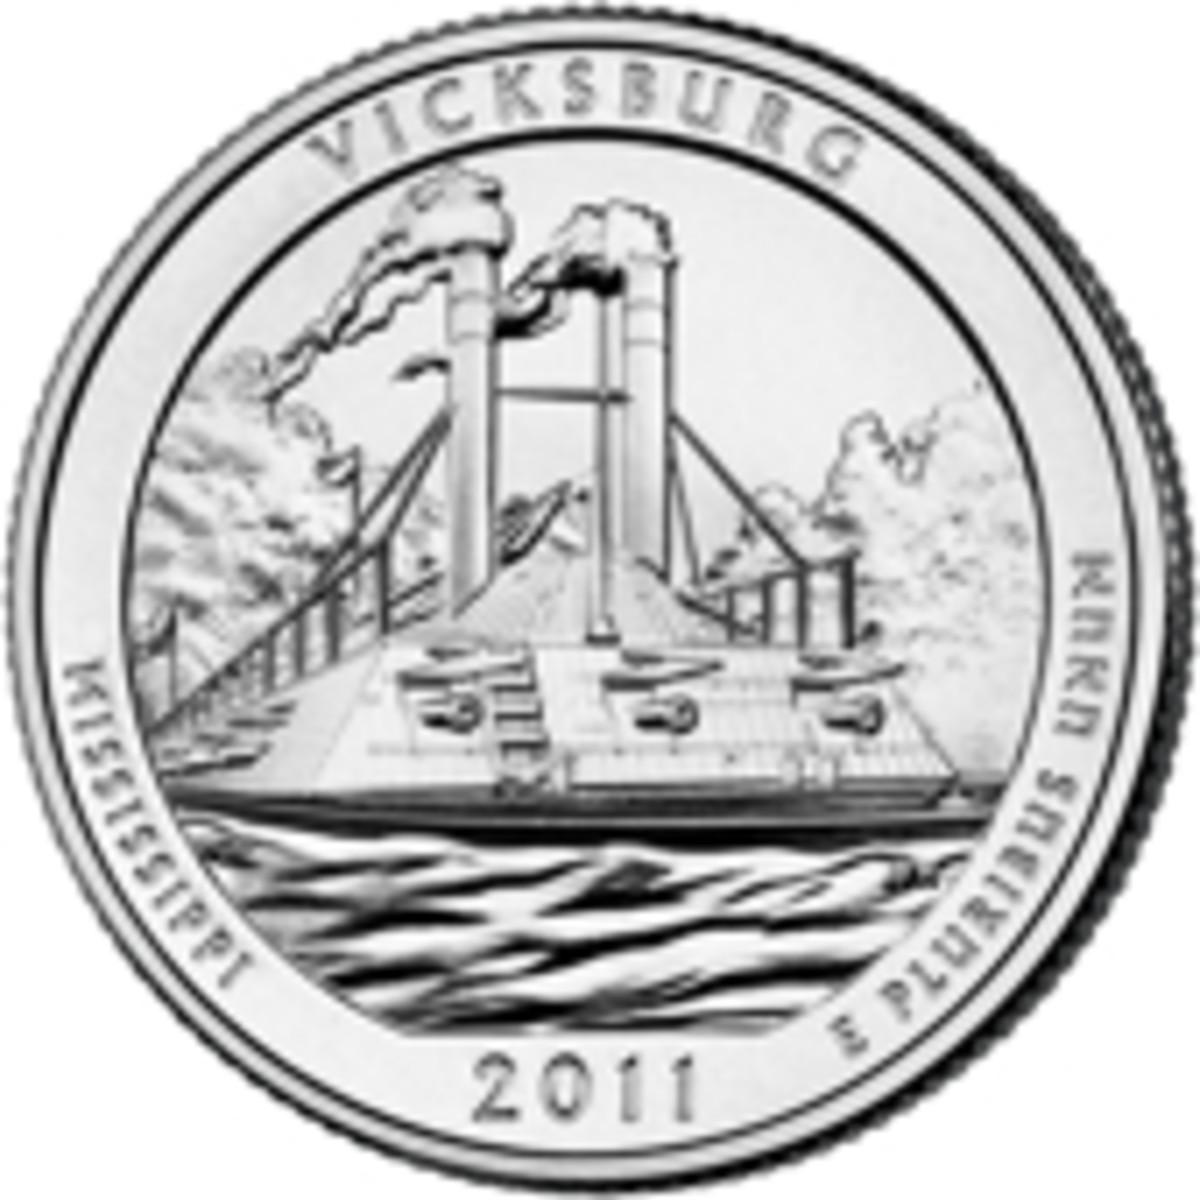 vicksburg170